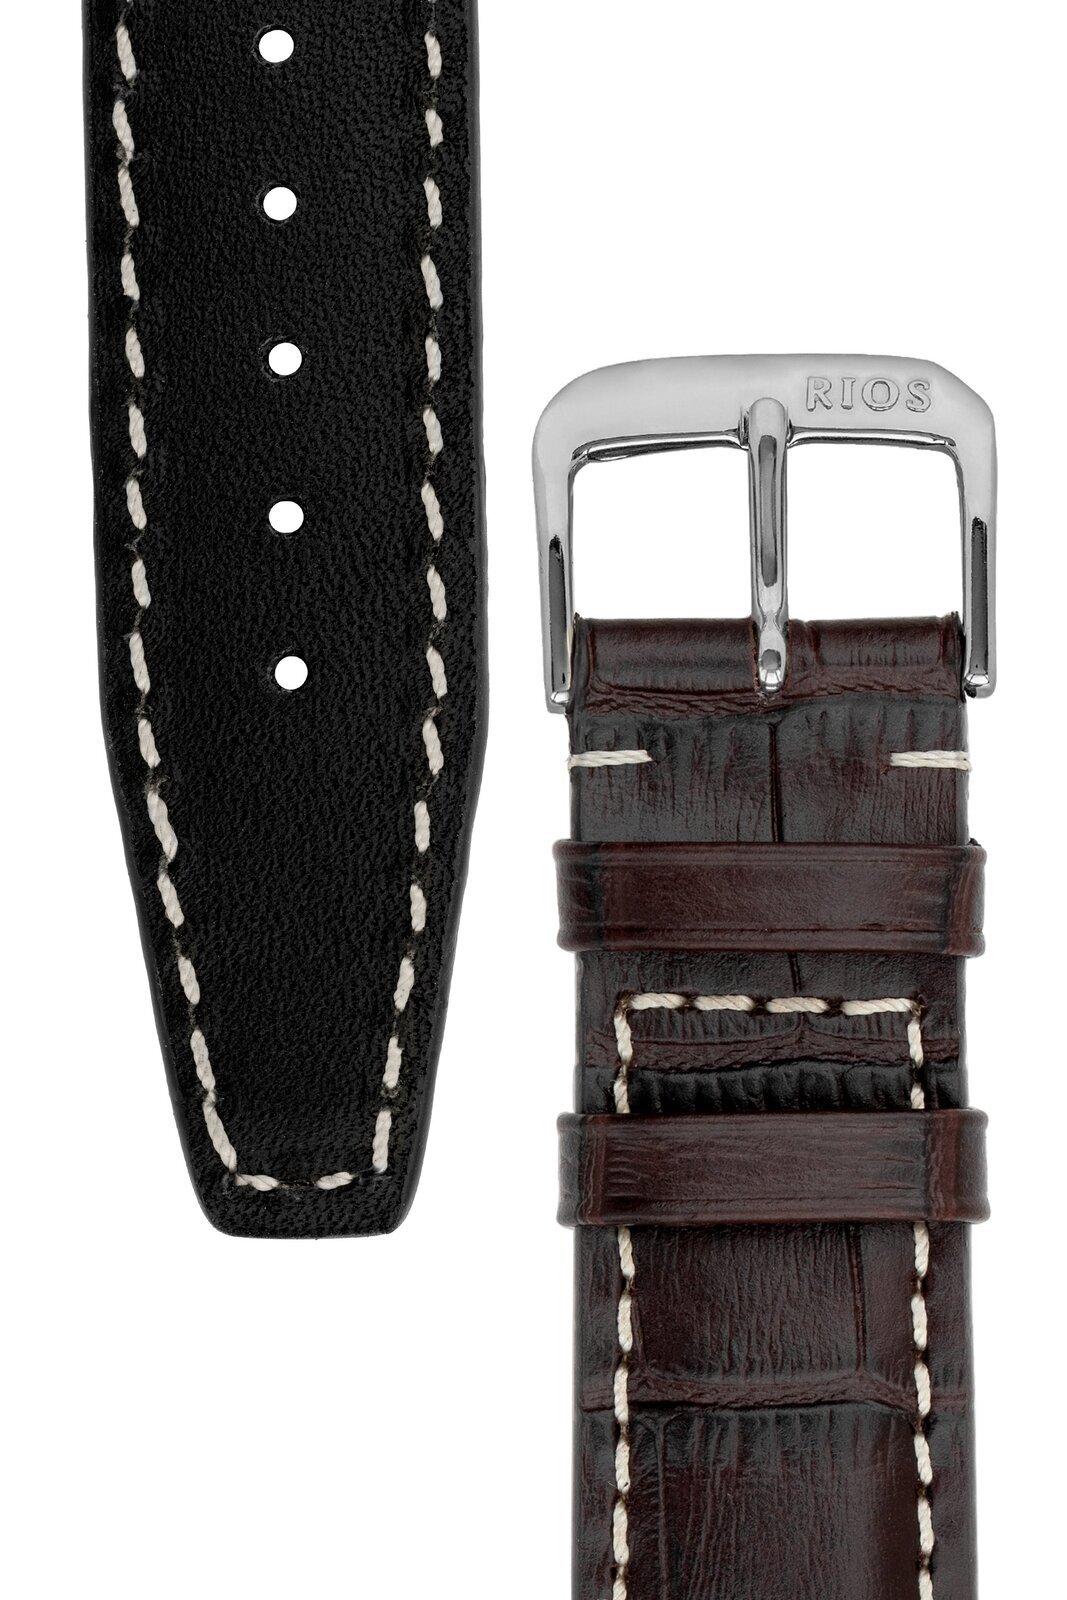 Rios1931 BOSTON Alligator-Embossed Leather Watch Strap in MOCHA